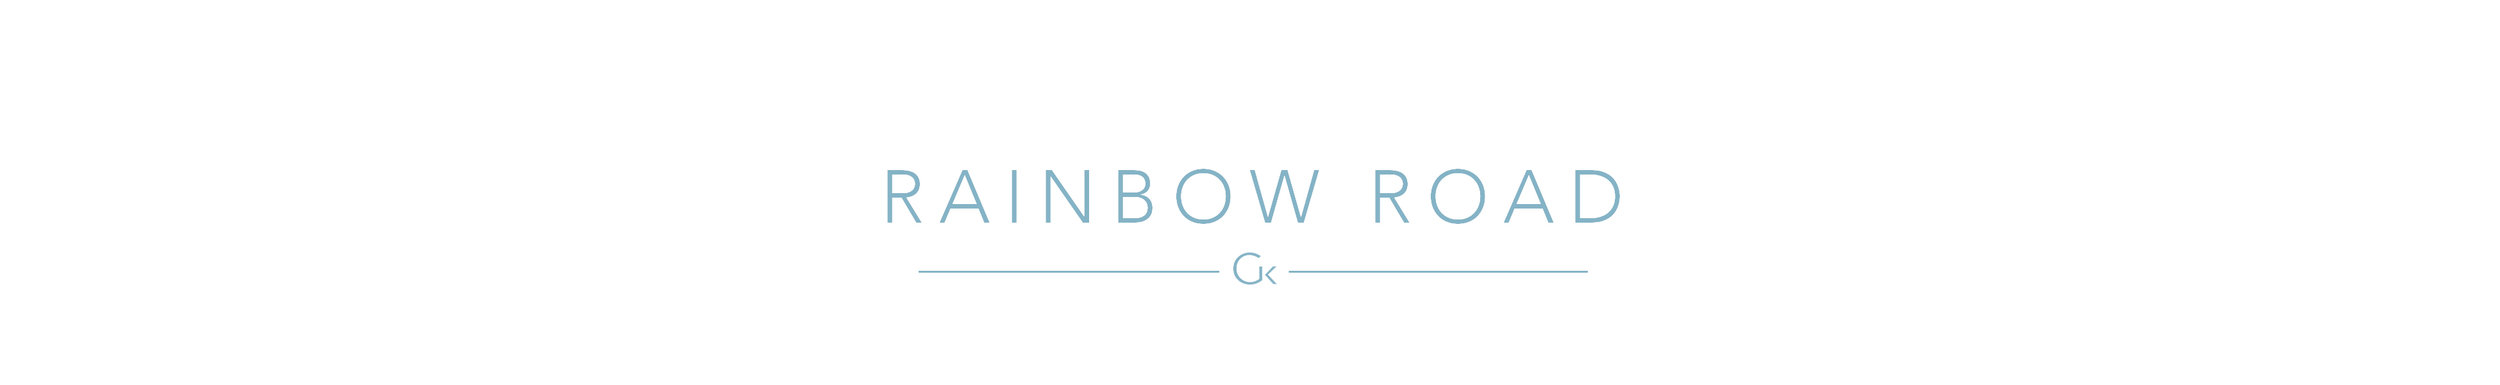 RAINBOWROAD.jpg